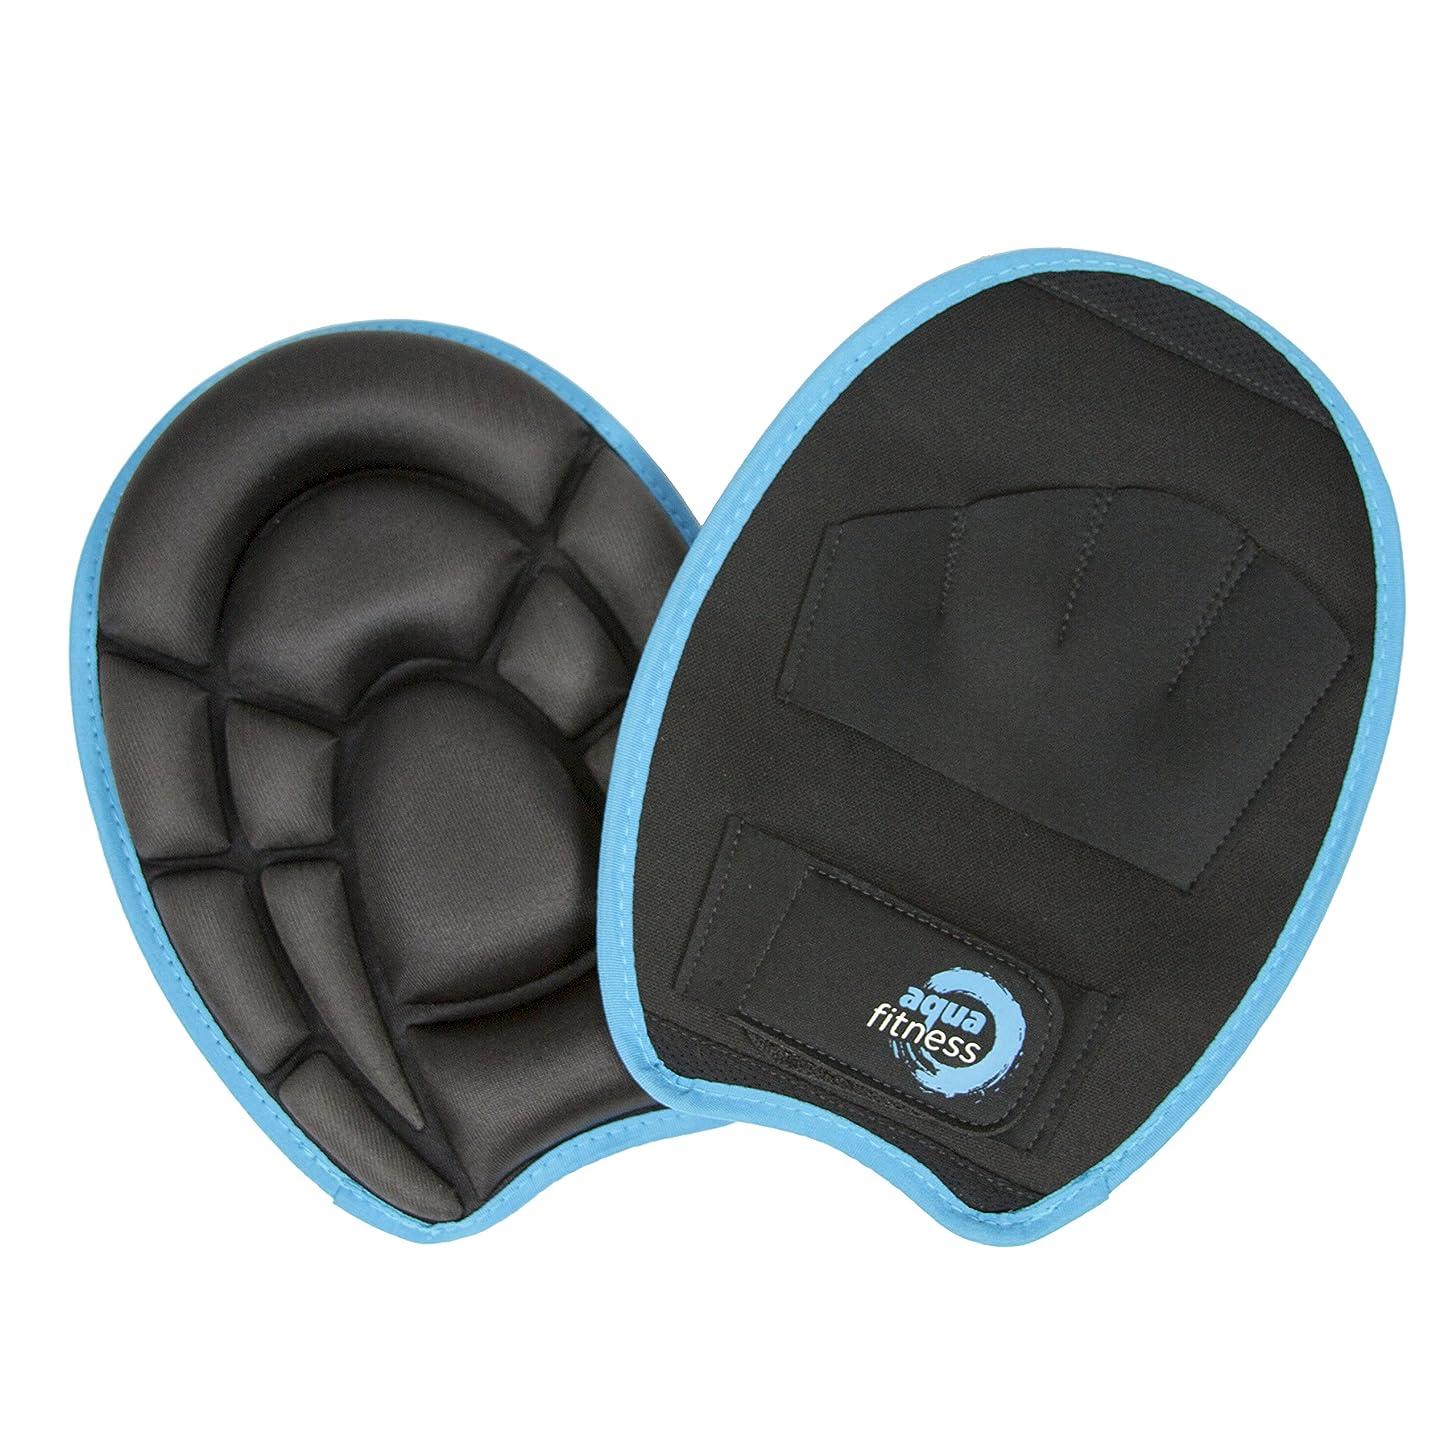 Aqua Fitness Premium Resistance Mitts, Gloves, Water Aerobics, Aquatic Low Impact Workout, Resistance Training